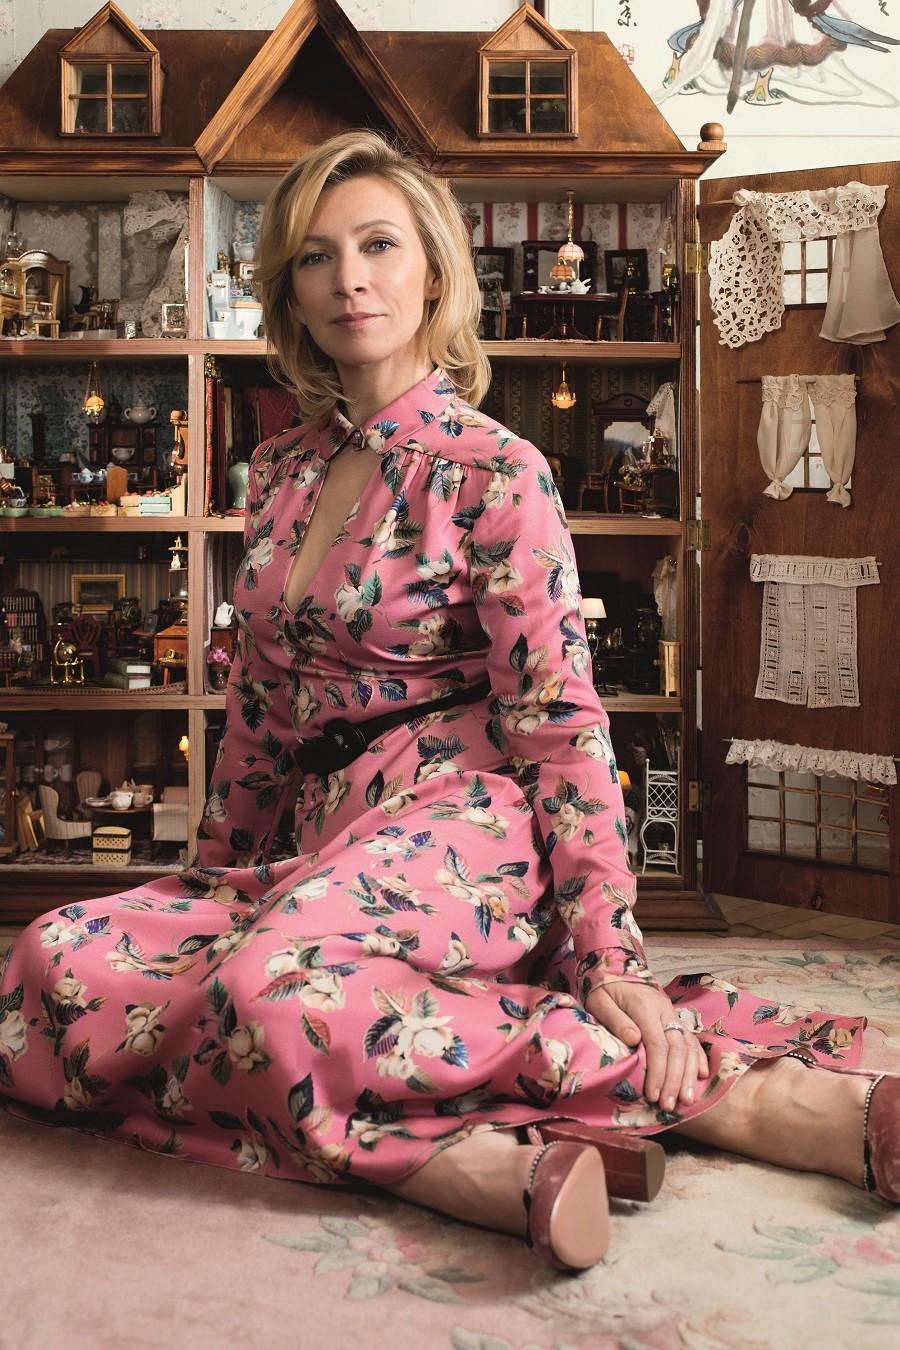 Dollhouse, smoking cigars & Russian designers: Zakharova gives rare glossy  mag interview — RT World News